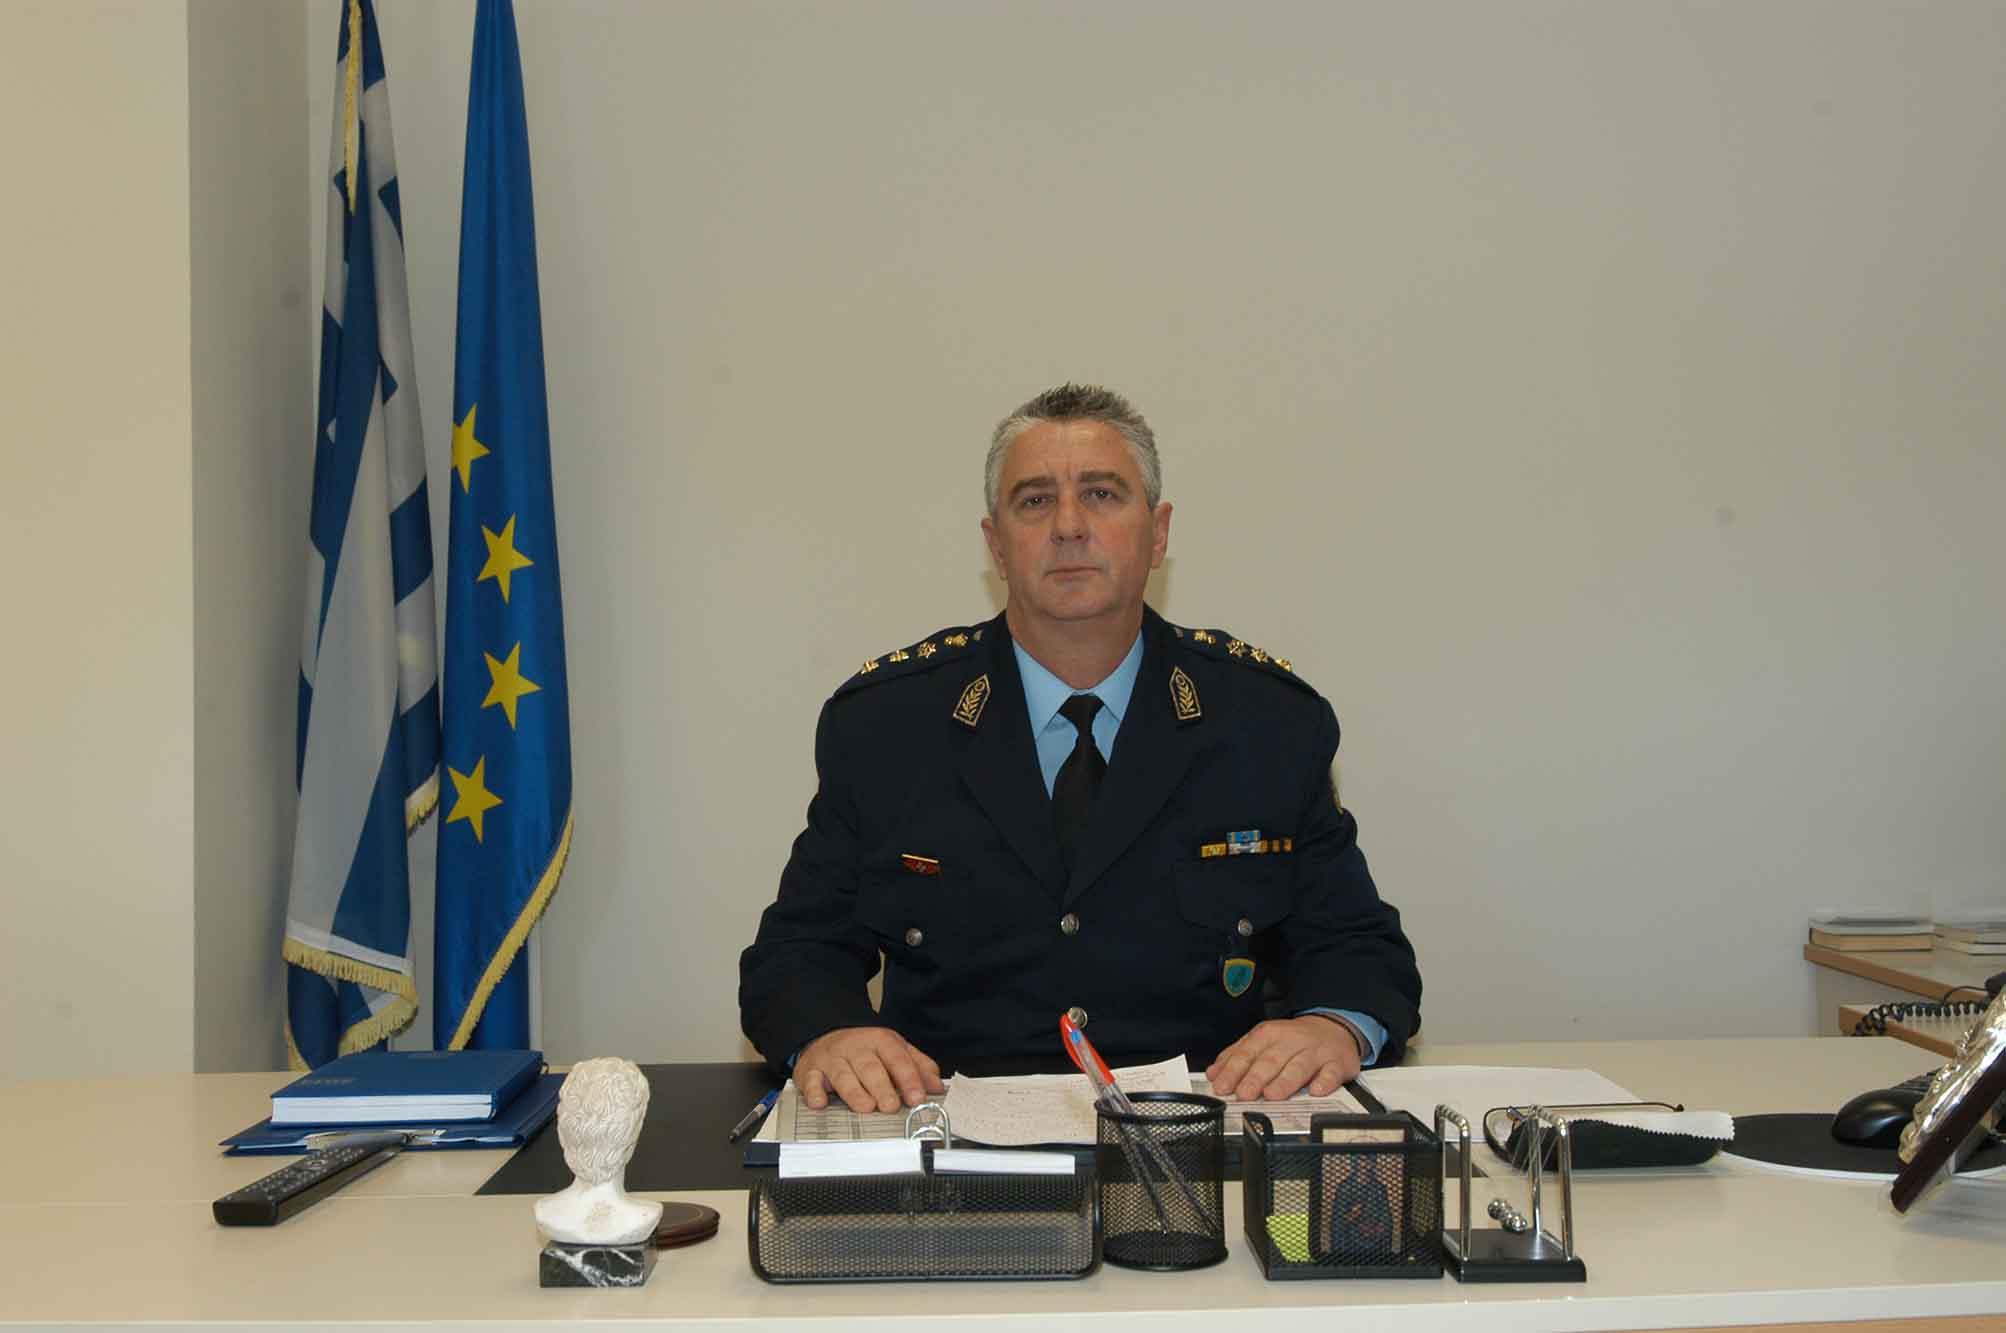 Nέος Γενικός Περιφερειακός Αστυνομικός Διευθυντής Δ. Μακεδονίας ο Δημοσθένης Χρήστου